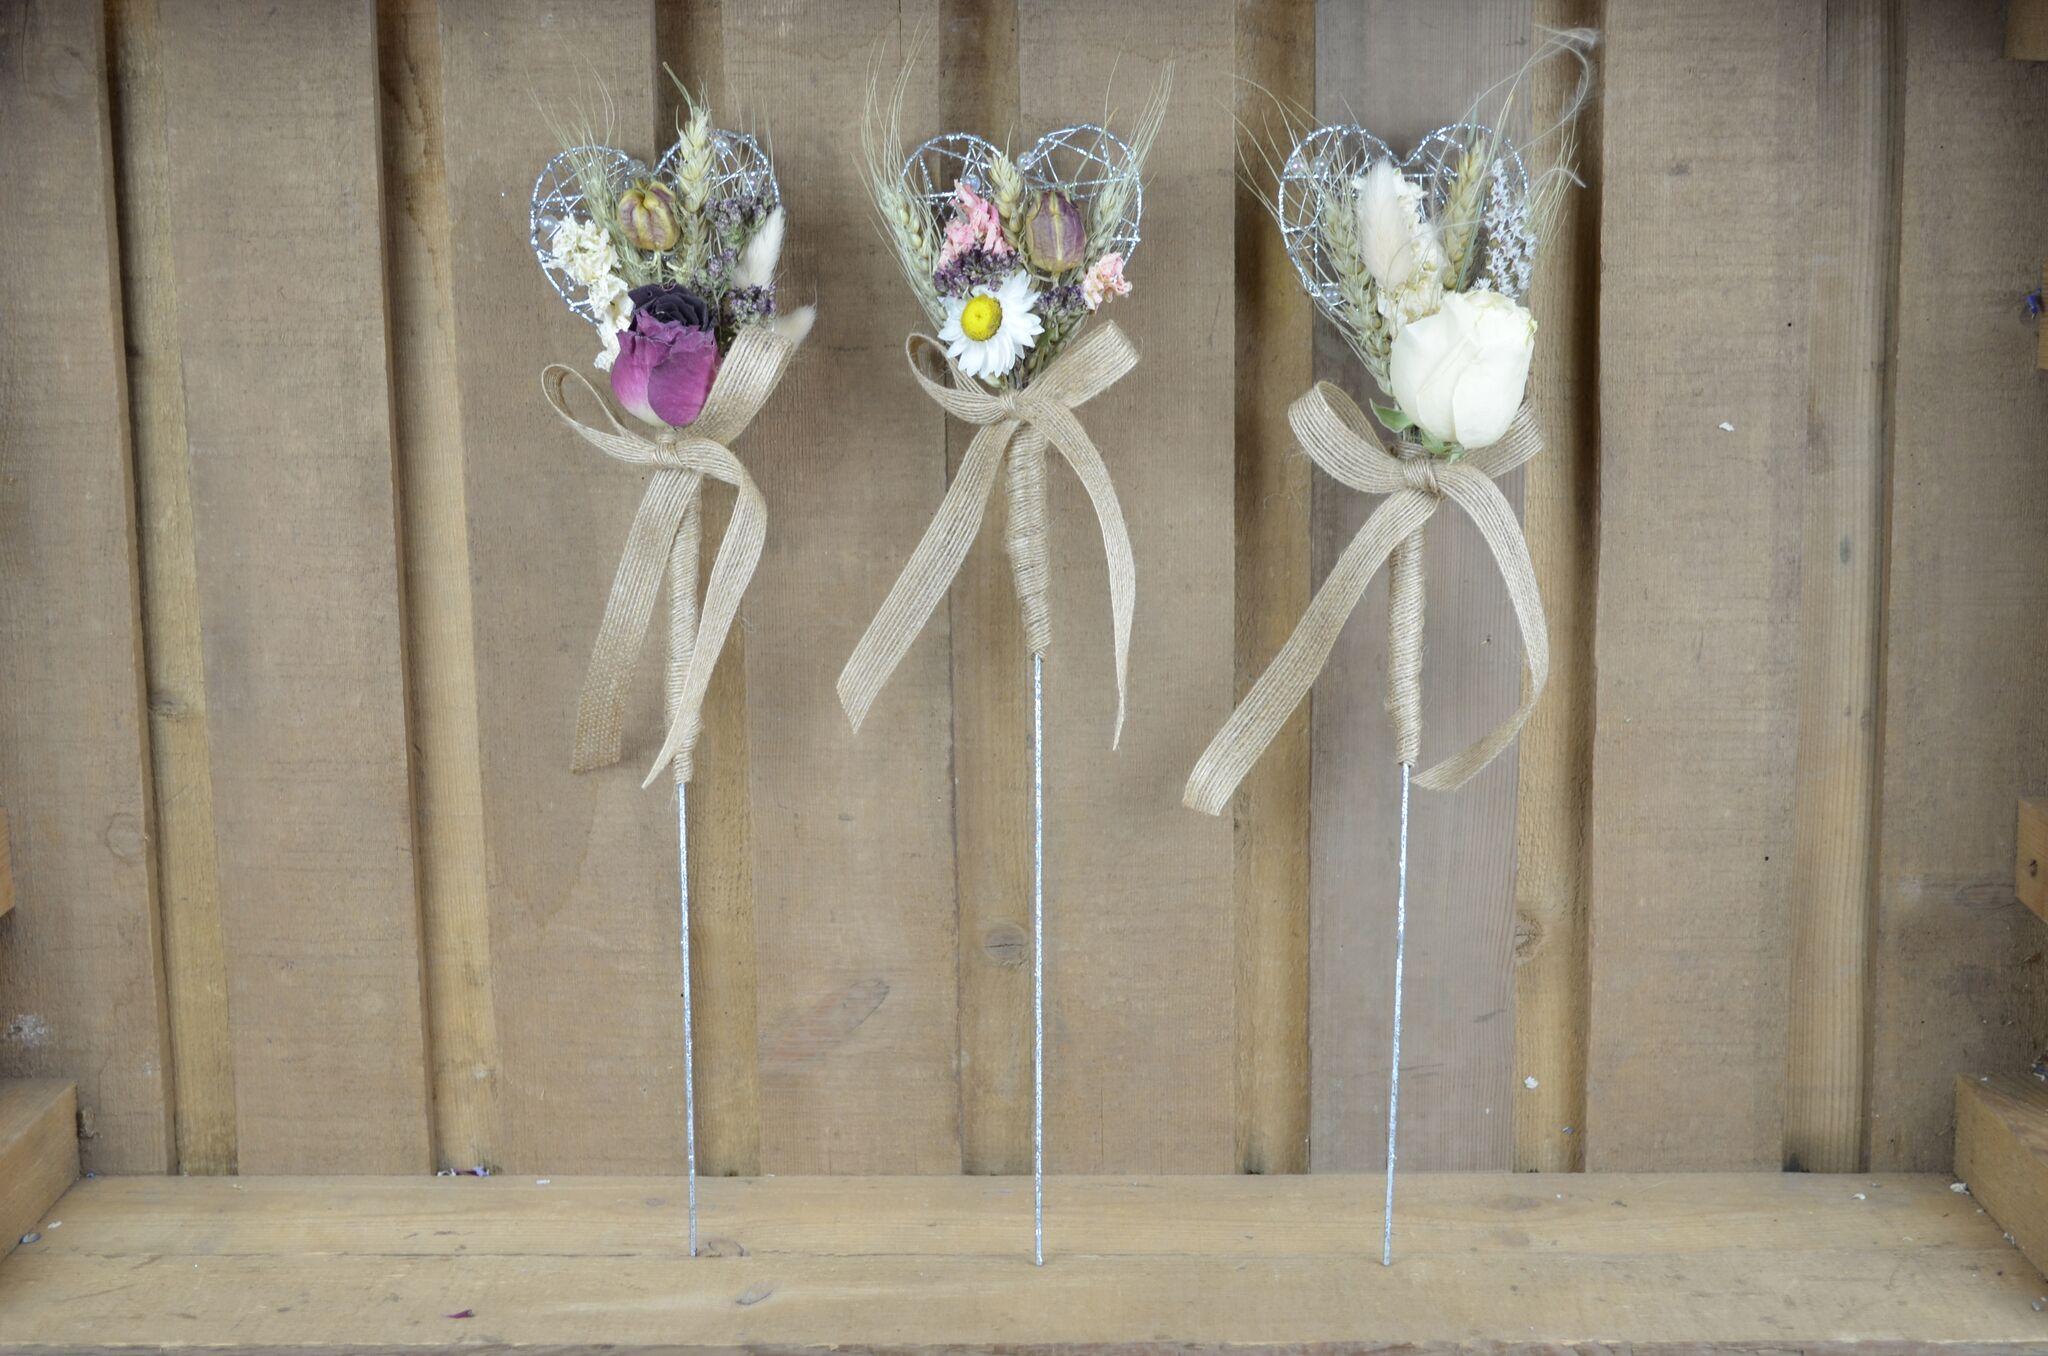 ShropshirePetals.com Burgundy, Country Garden and White Flower Girl Wands £9.50 each (2)_preview